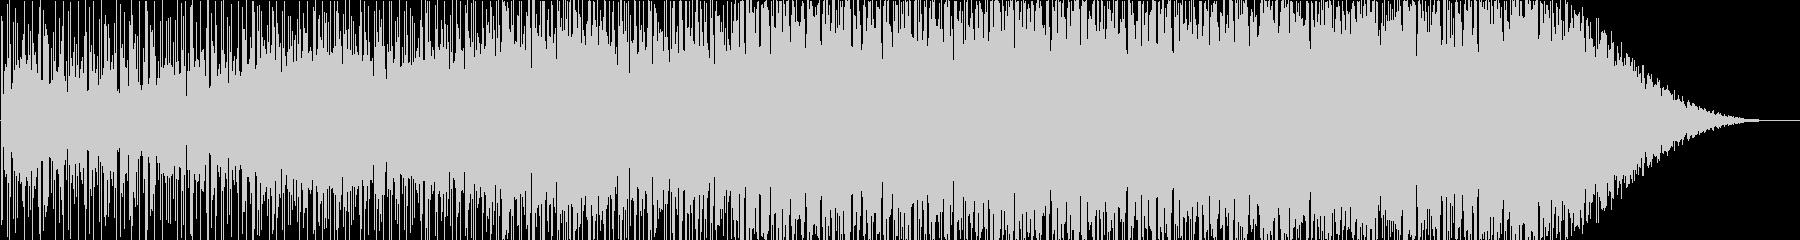 Ultramontaneの未再生の波形